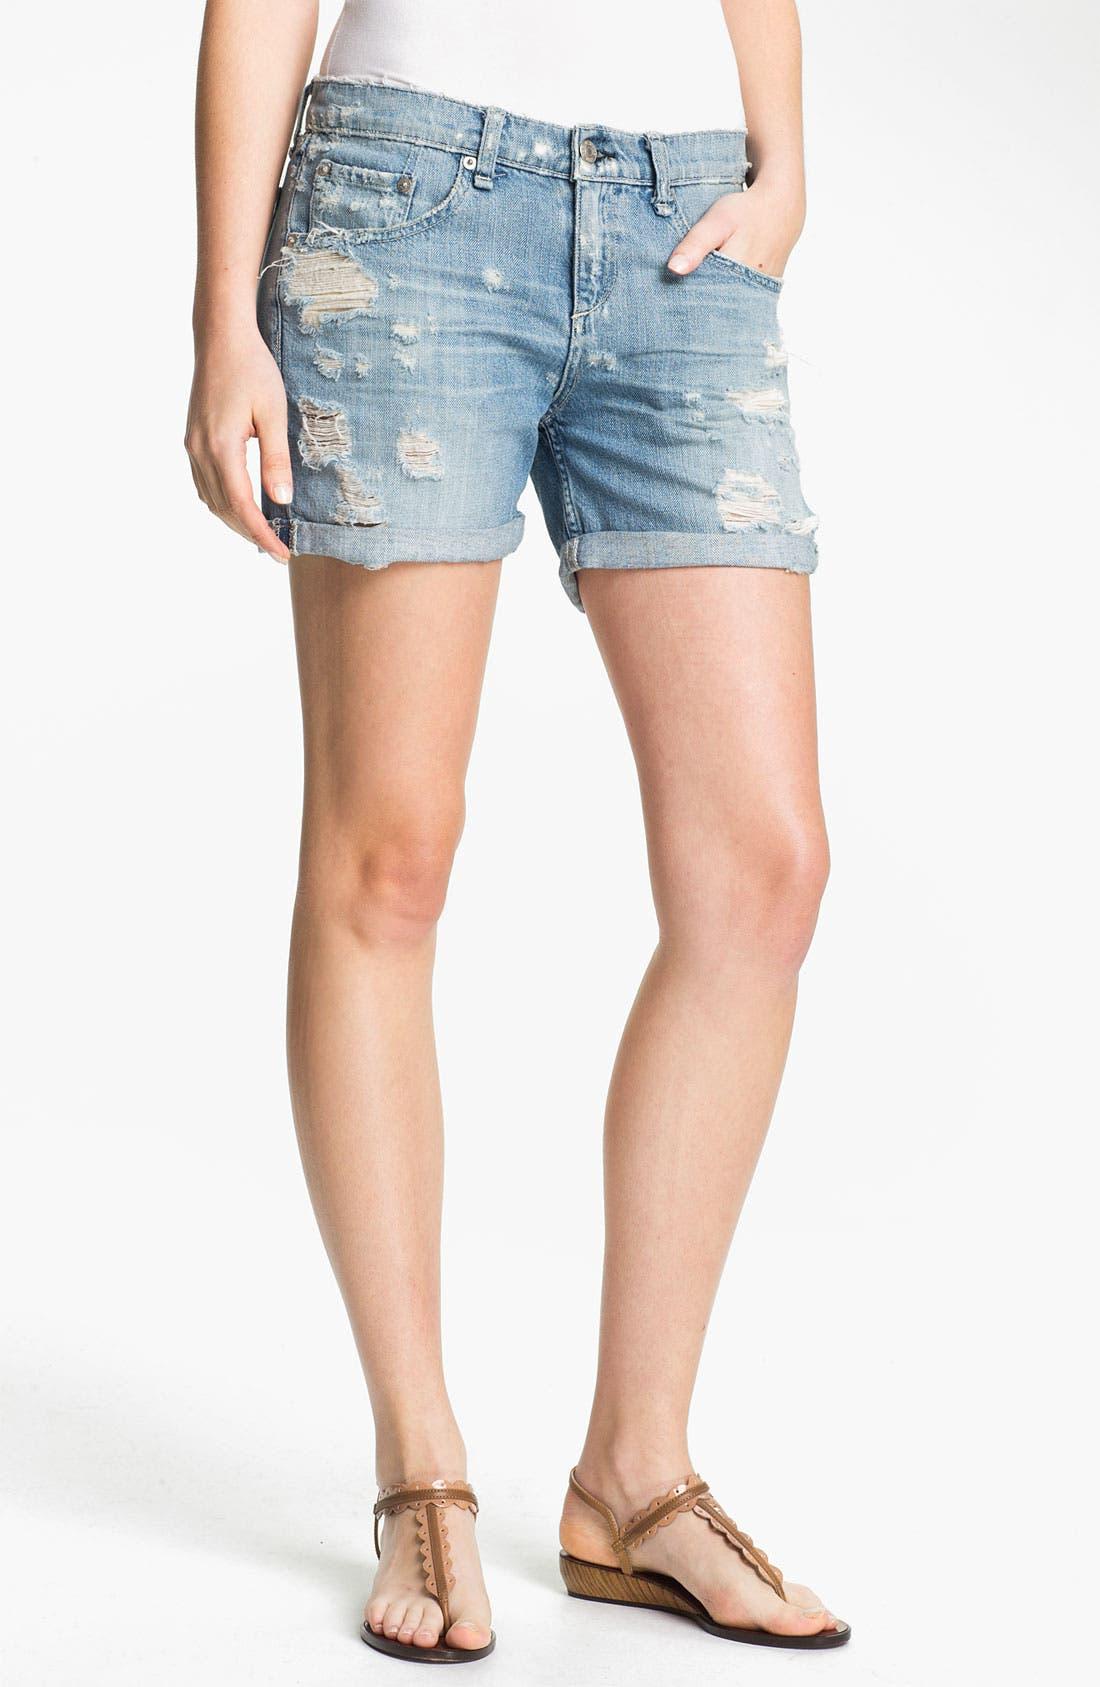 Alternate Image 1 Selected - rag & bone/JEAN 'The Boyfriend' Shorts